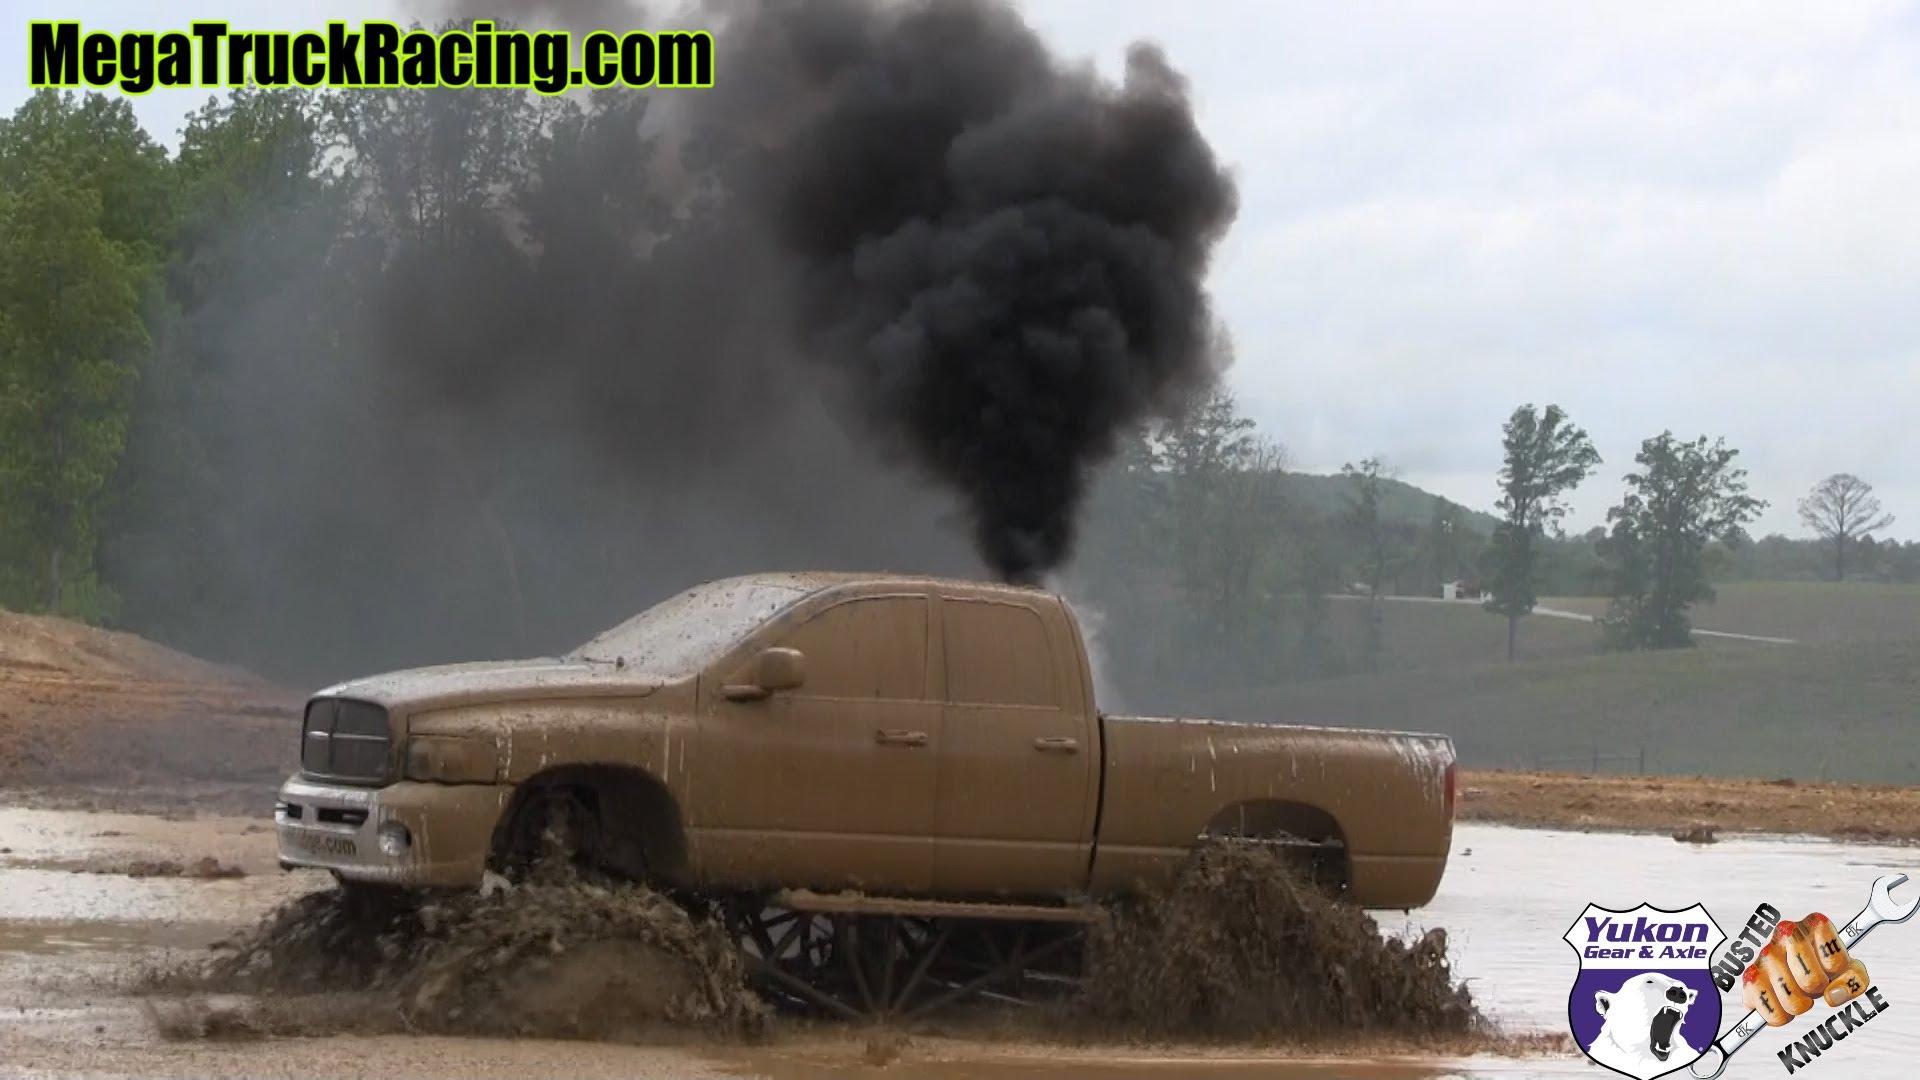 Diesel Trucks Rollin Coal 1126610 Hd Wallpaper Backgrounds Download